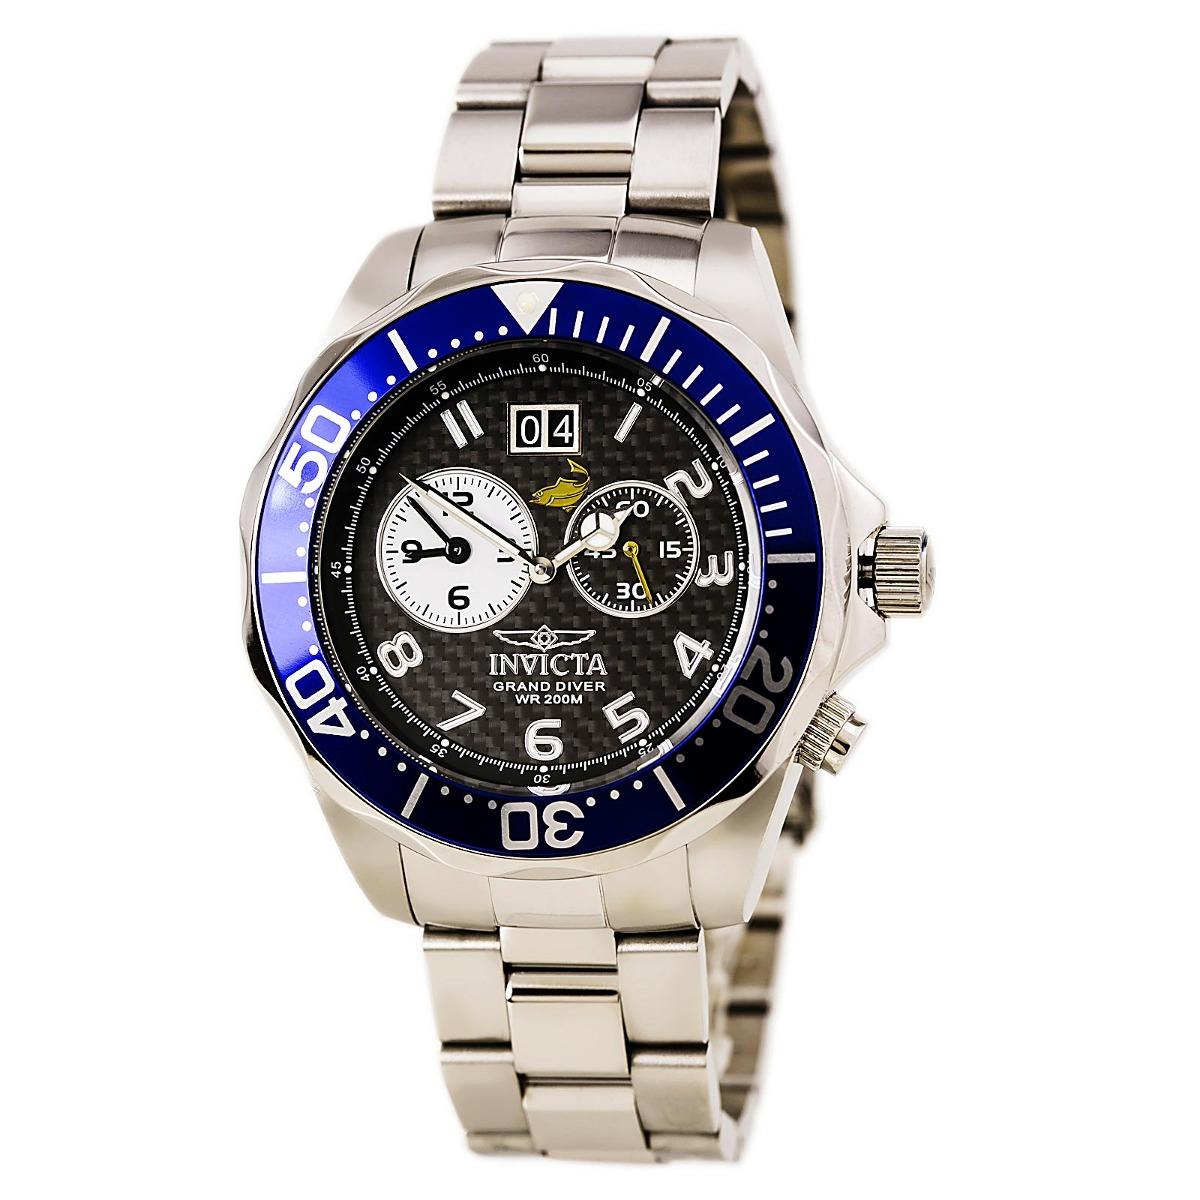 Reloj Invicta Para Hombre 14442 Pulsera En Acero Bisel Azul ... 8150a15e6f44